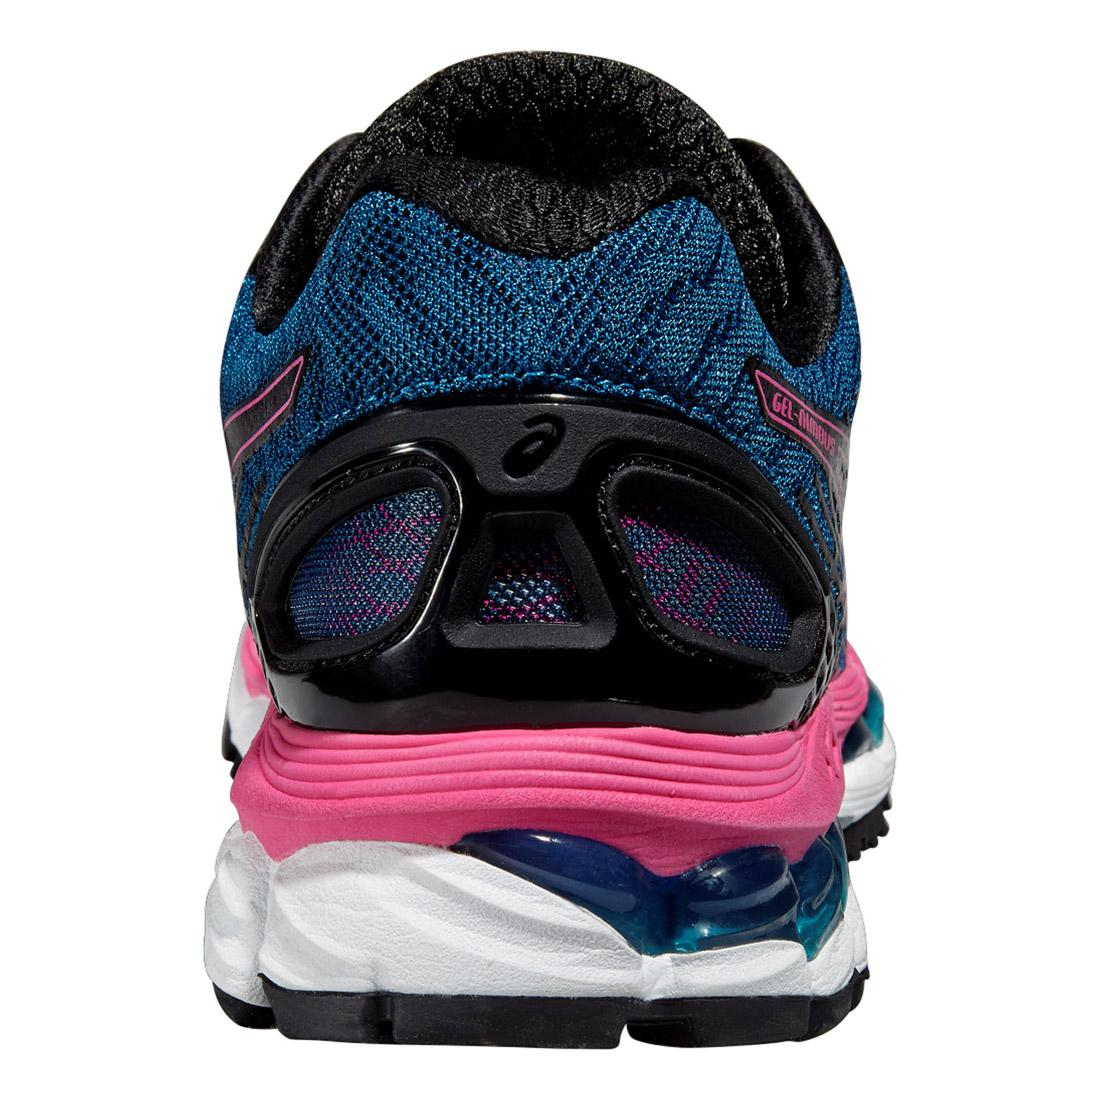 buy popular 4edcc 385eb Asics Womens GEL-Nimbus 17 Running Shoes - Mosaic Blue/Pink